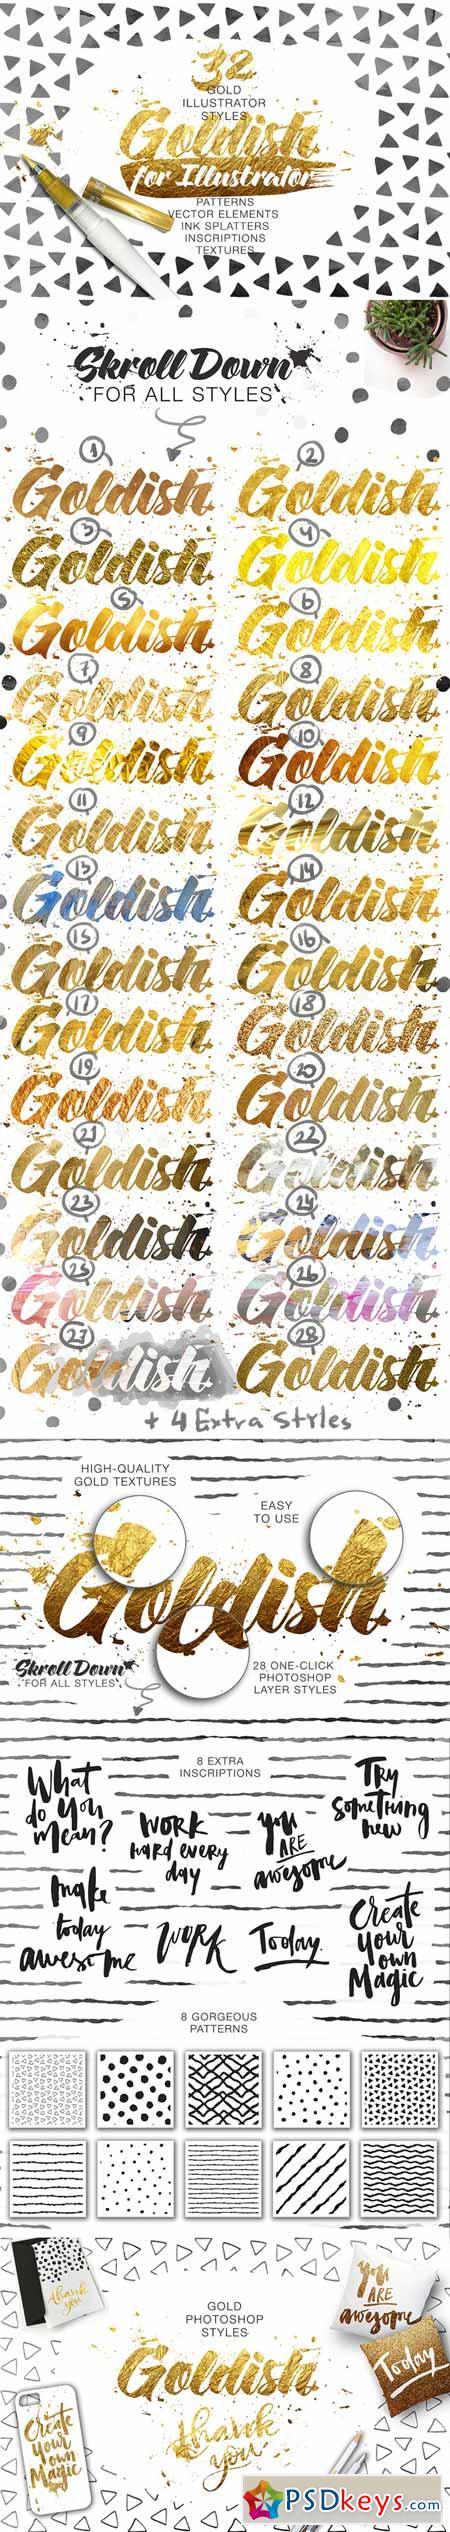 Goldish Kit. For Illustrator+Extras 458359